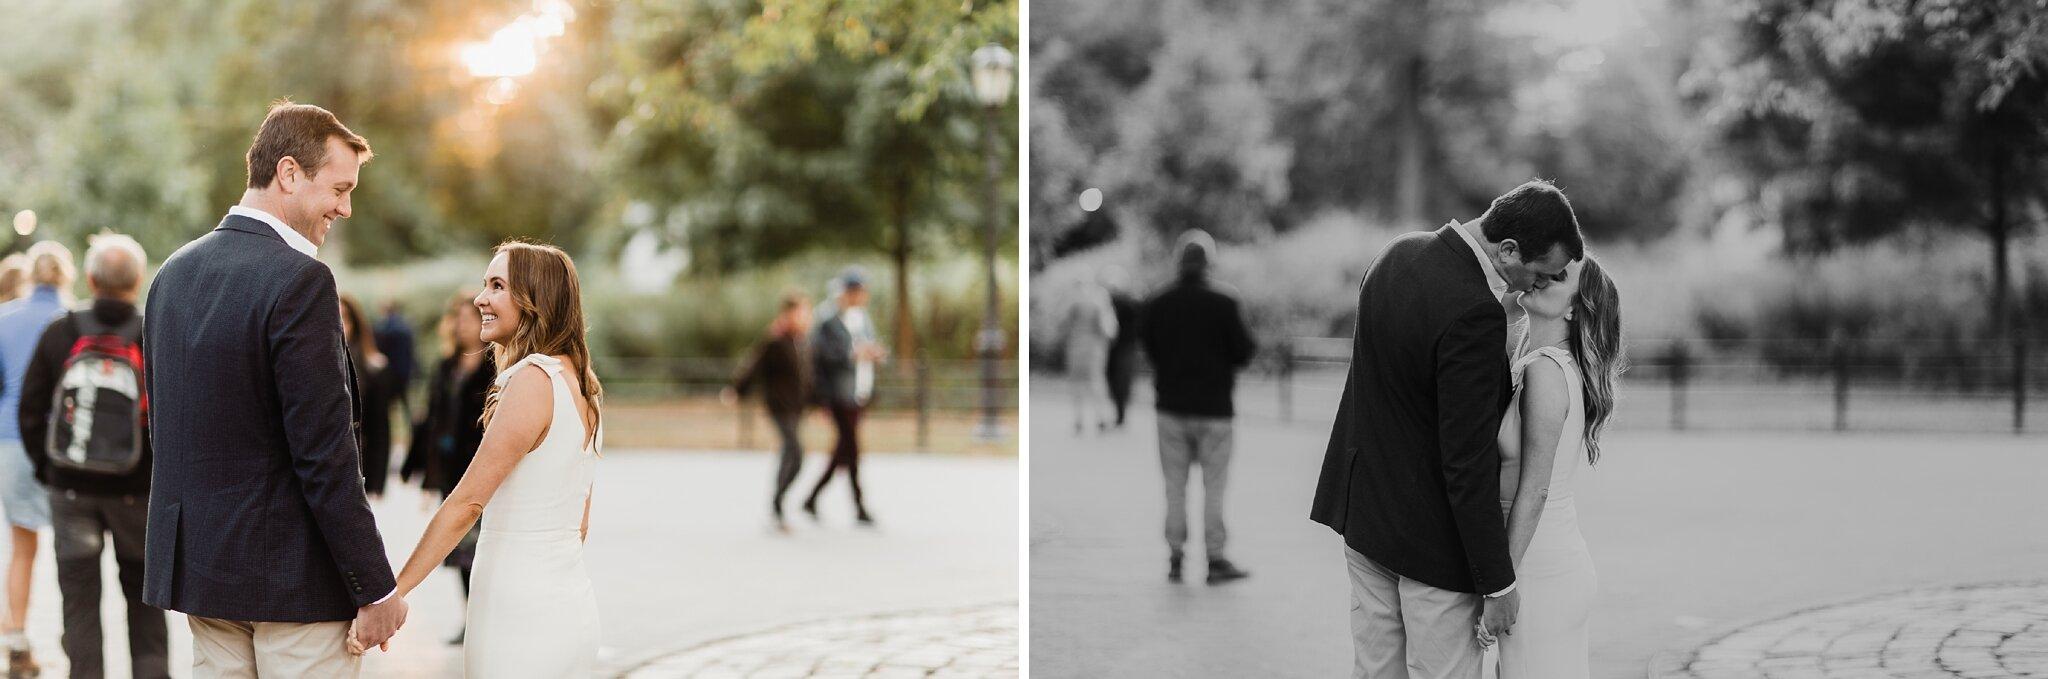 Alicia+lucia+photography+-+albuquerque+wedding+photographer+-+santa+fe+wedding+photography+-+new+mexico+wedding+photographer+-+new+mexico+wedding+-+engagement+-+new+york+engagement+-+new+york+city+engagement+-+central+park+engagement_0020.jpg